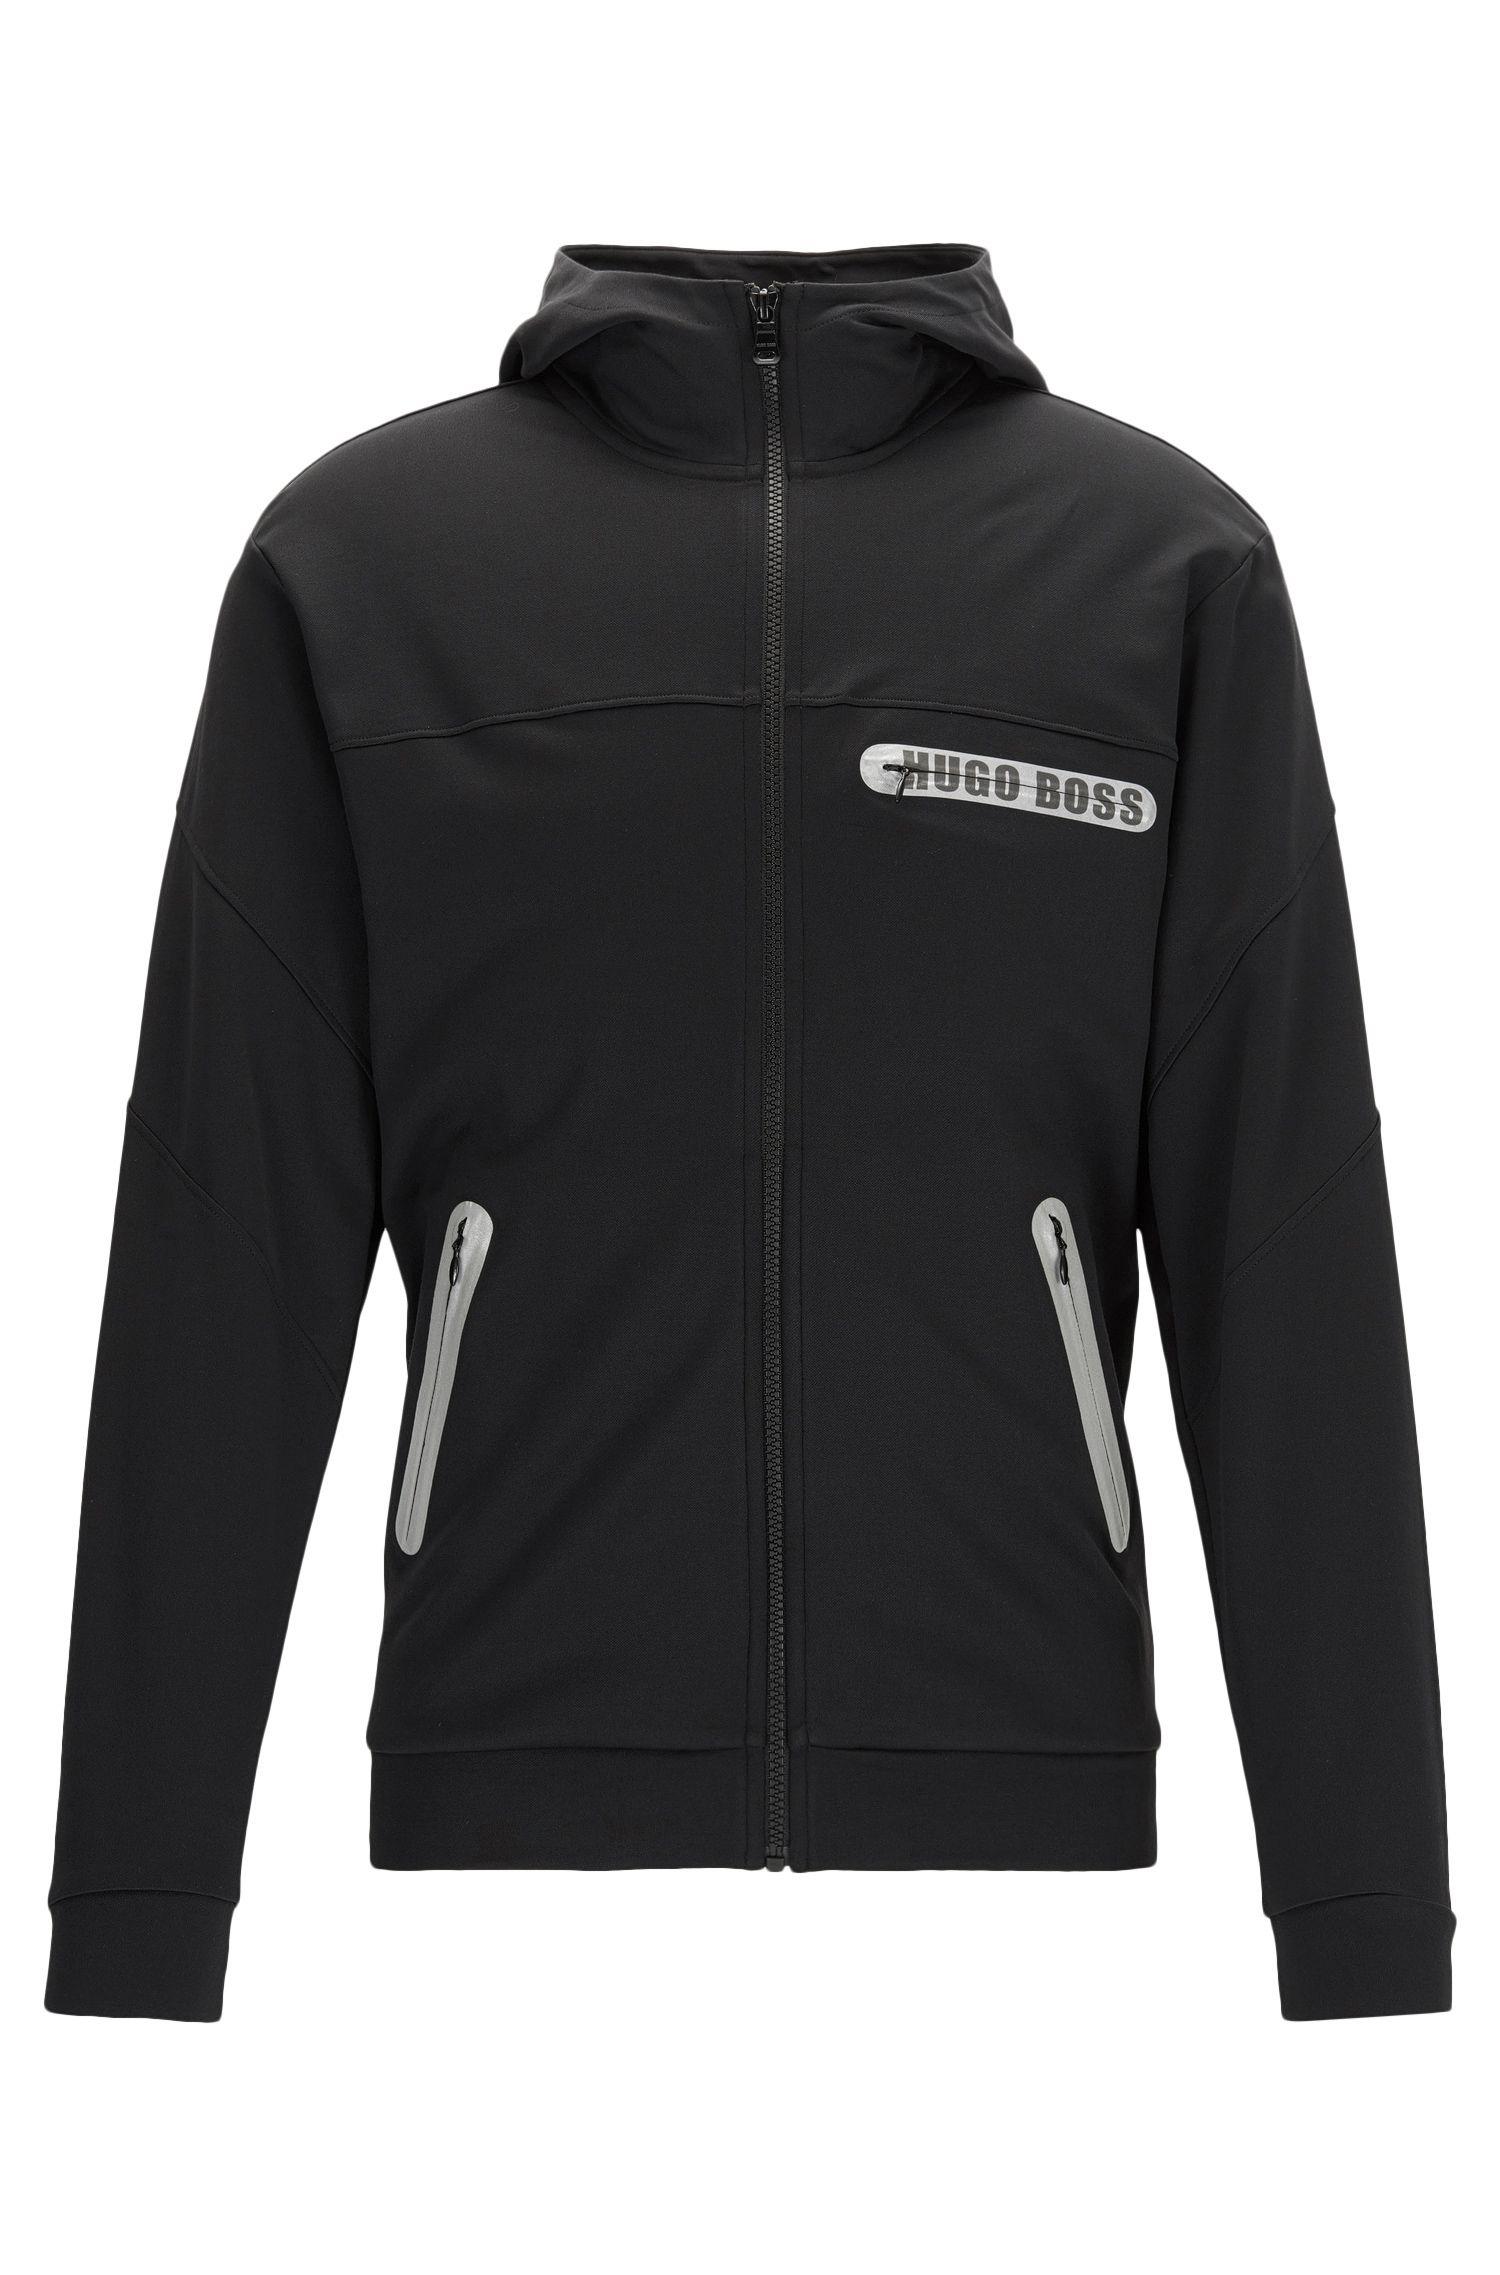 Regular-fit zip-through jacket in a cotton blend